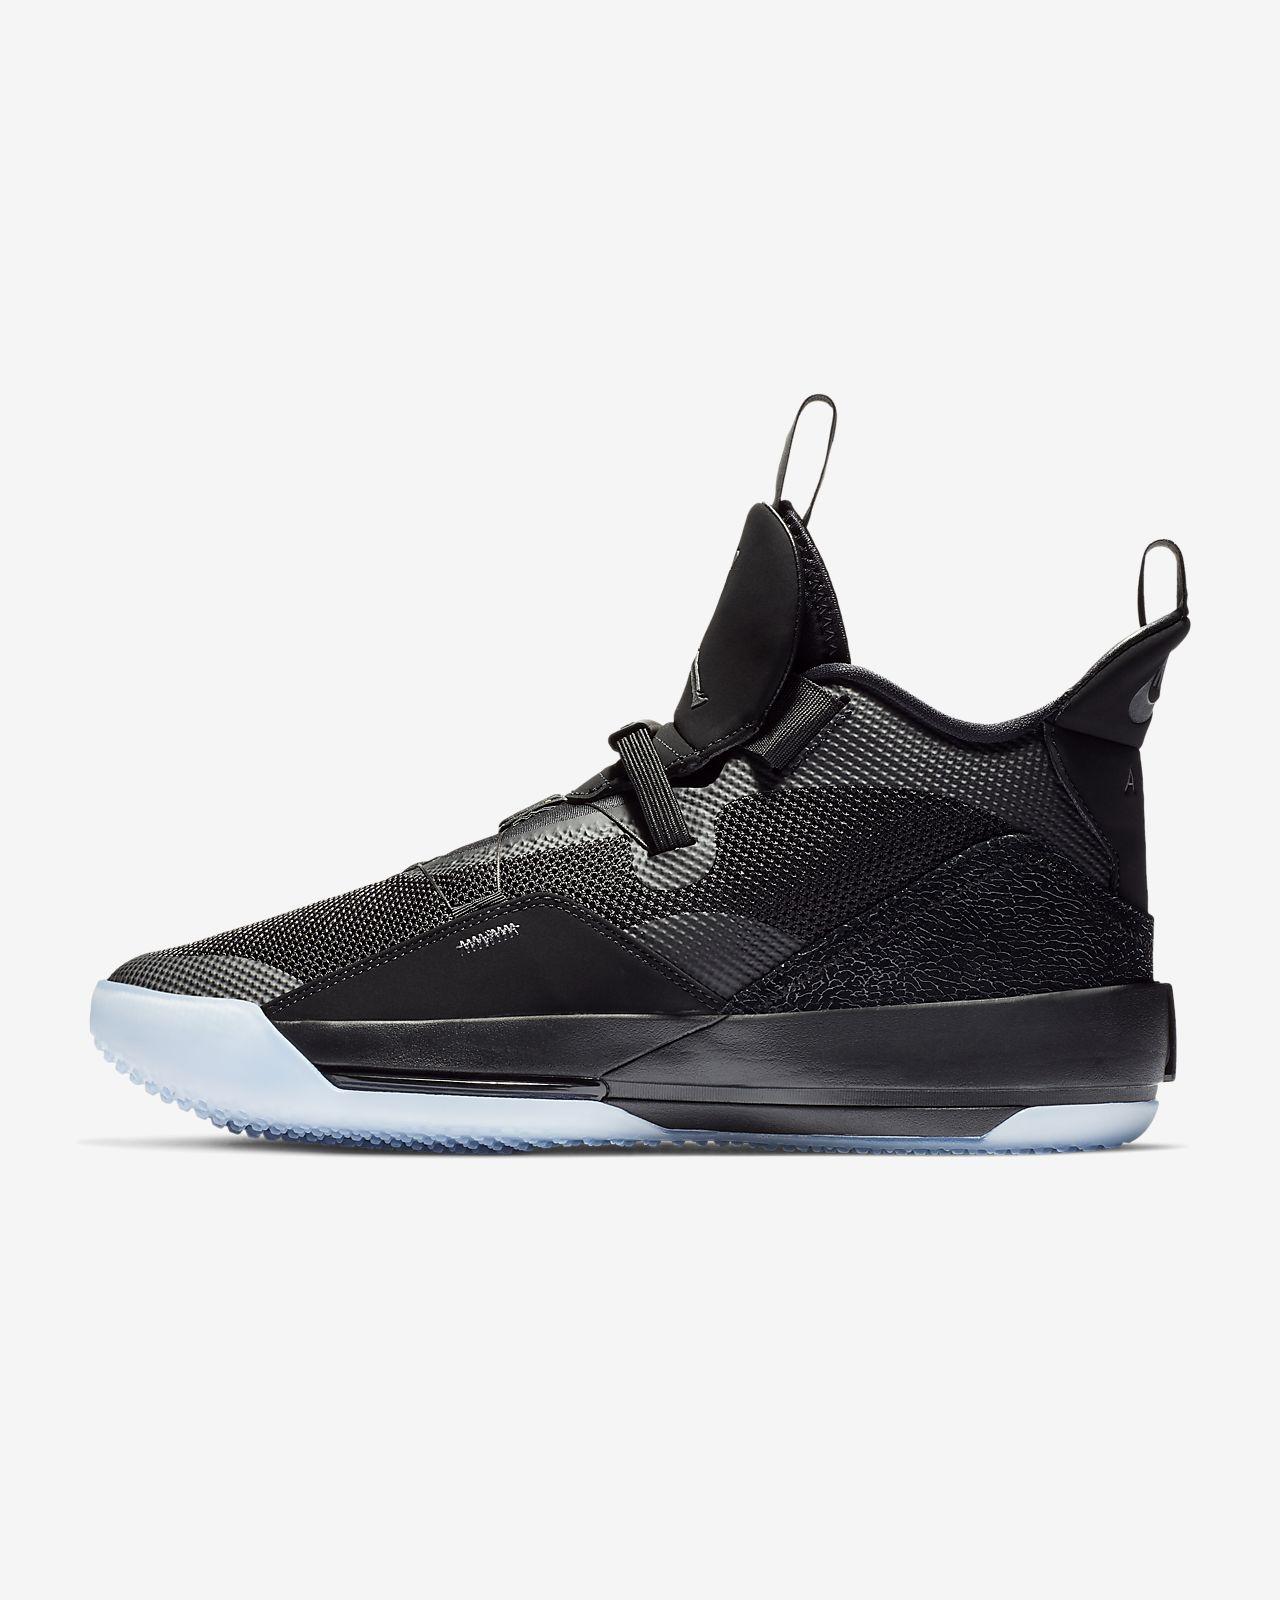 0e131250cfb6 Air Jordan XXXIII Men s Basketball Shoe. Nike.com